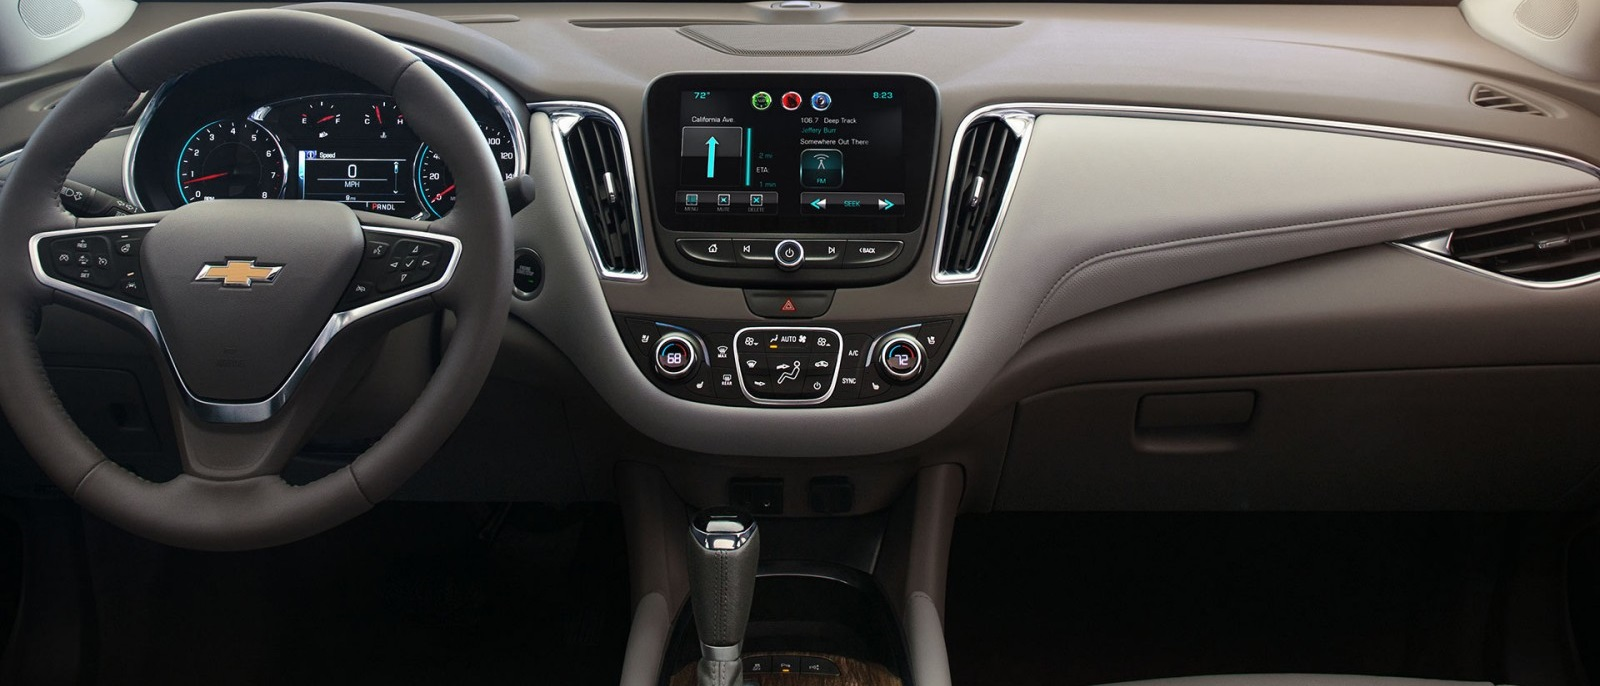 2016 Chevrolet Malibu Hybrid Florence Cincinnati Tom